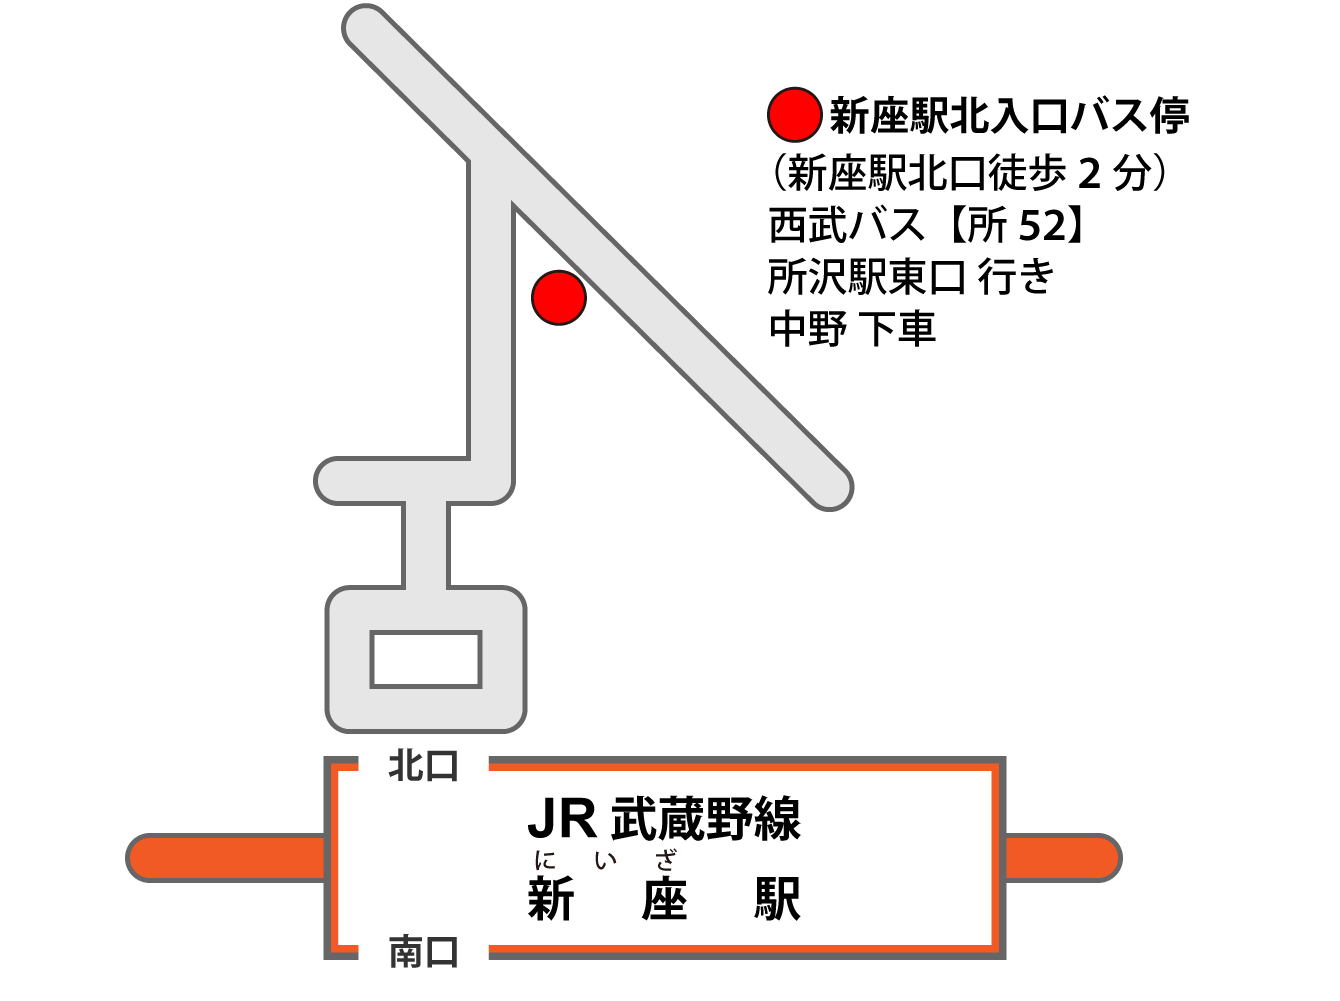 新座駅バス乗り場